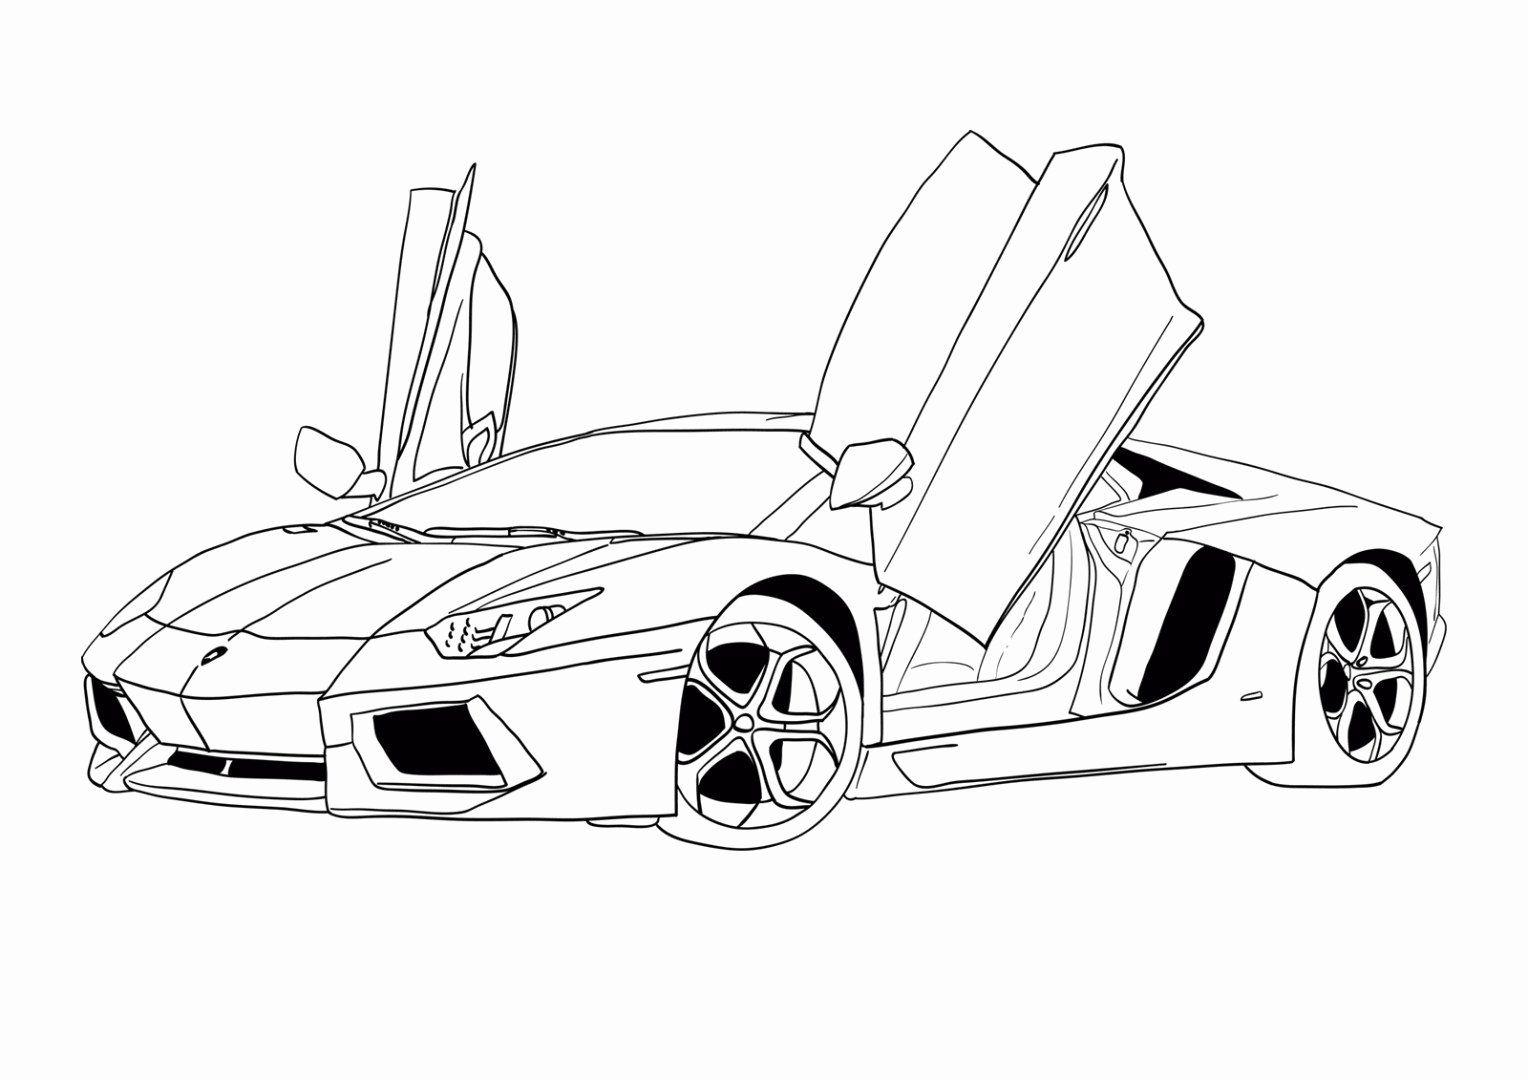 Coloring Book Sports Car Lovely 71 Lamborghini Aventador Ausmalbilder Cars Coloring Pages Truck Coloring Pages Race Car Coloring Pages